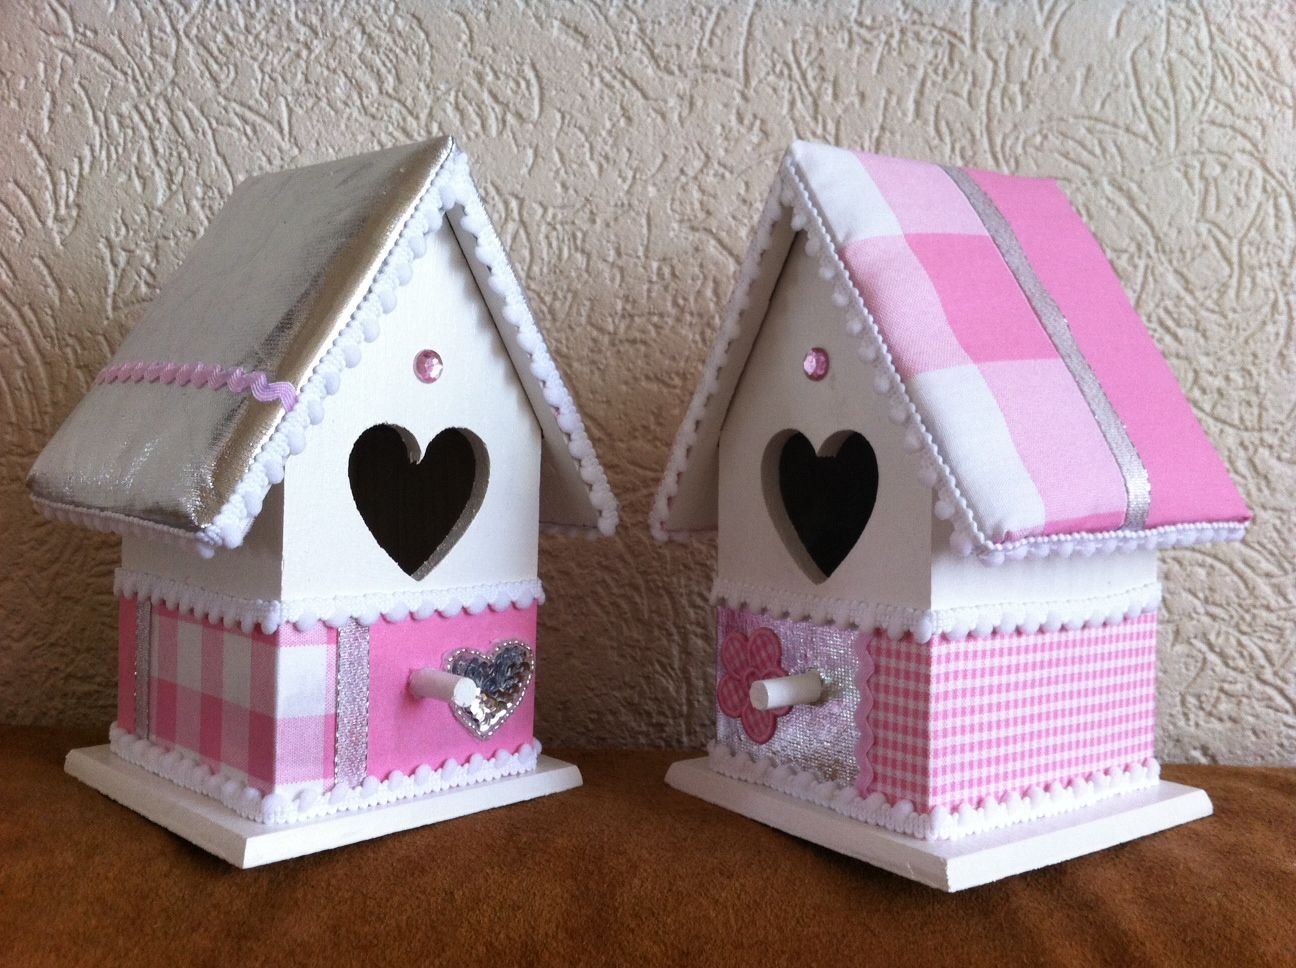 1000+ images about Ideeën voor meisjes babykamer on Pinterest ...